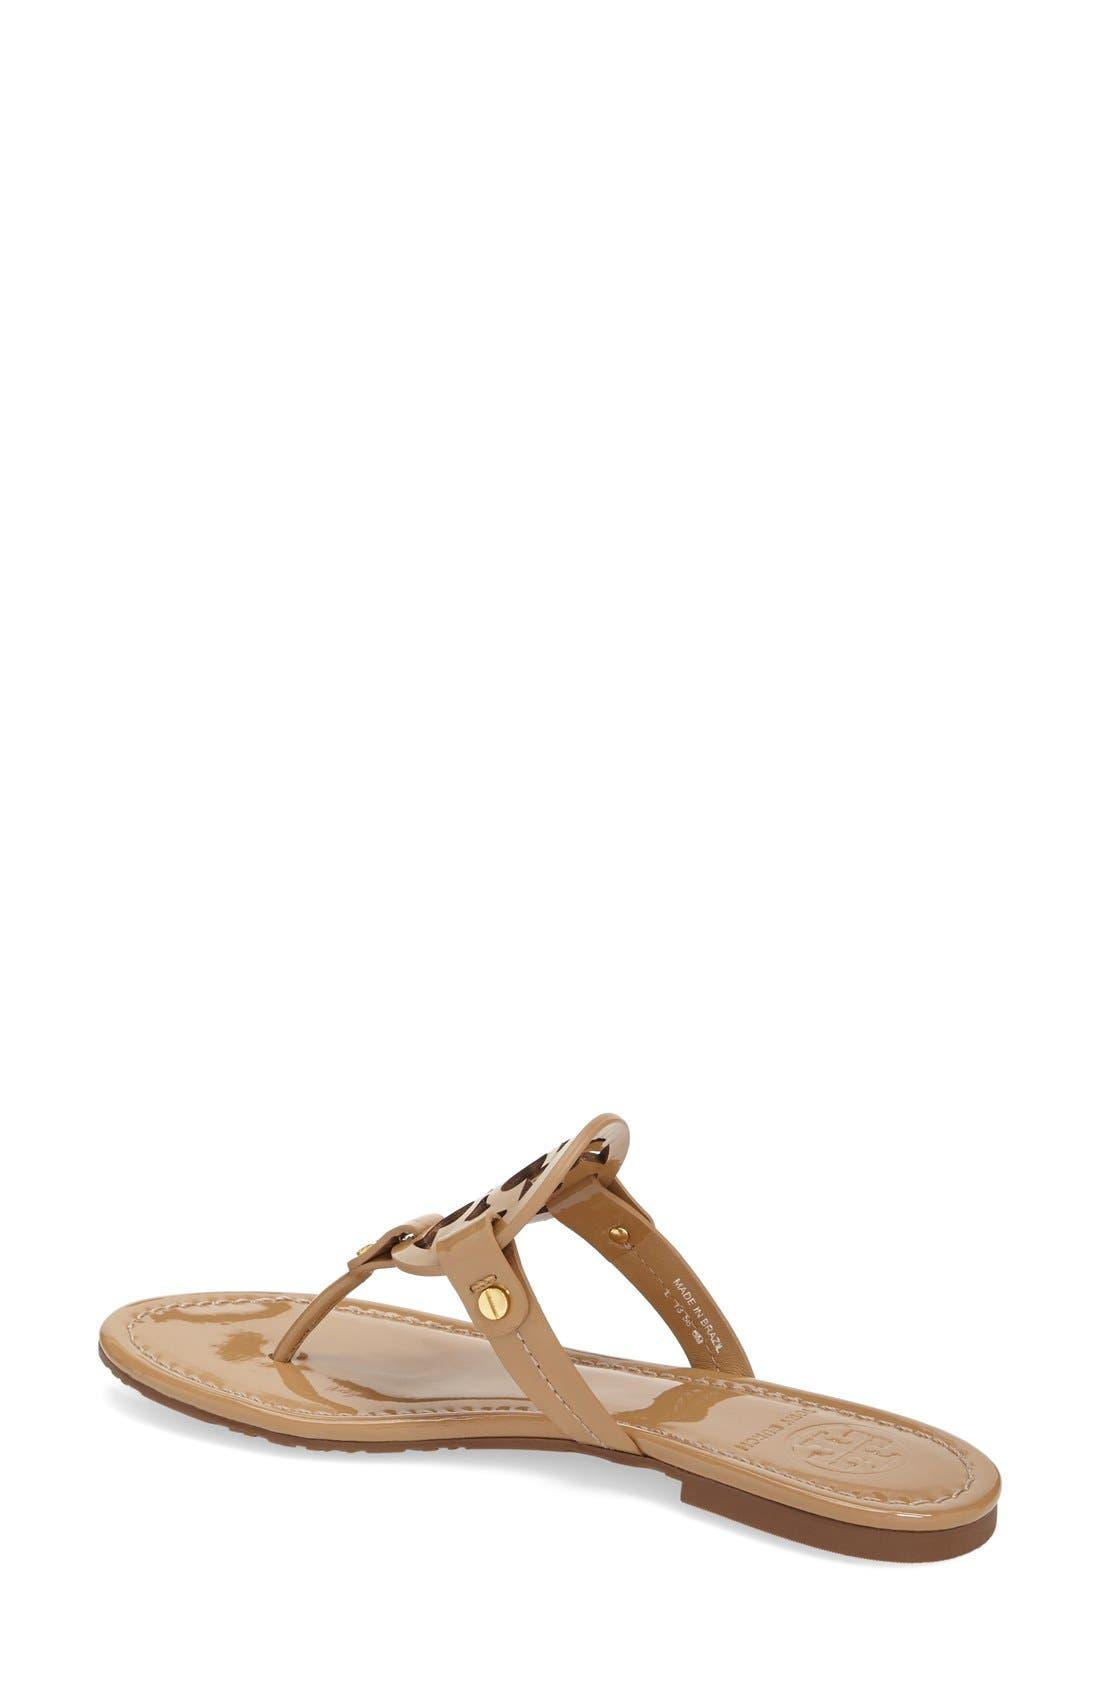 Alternate Image 2  - Tory Burch 'Miller' Flip Flop (Women)